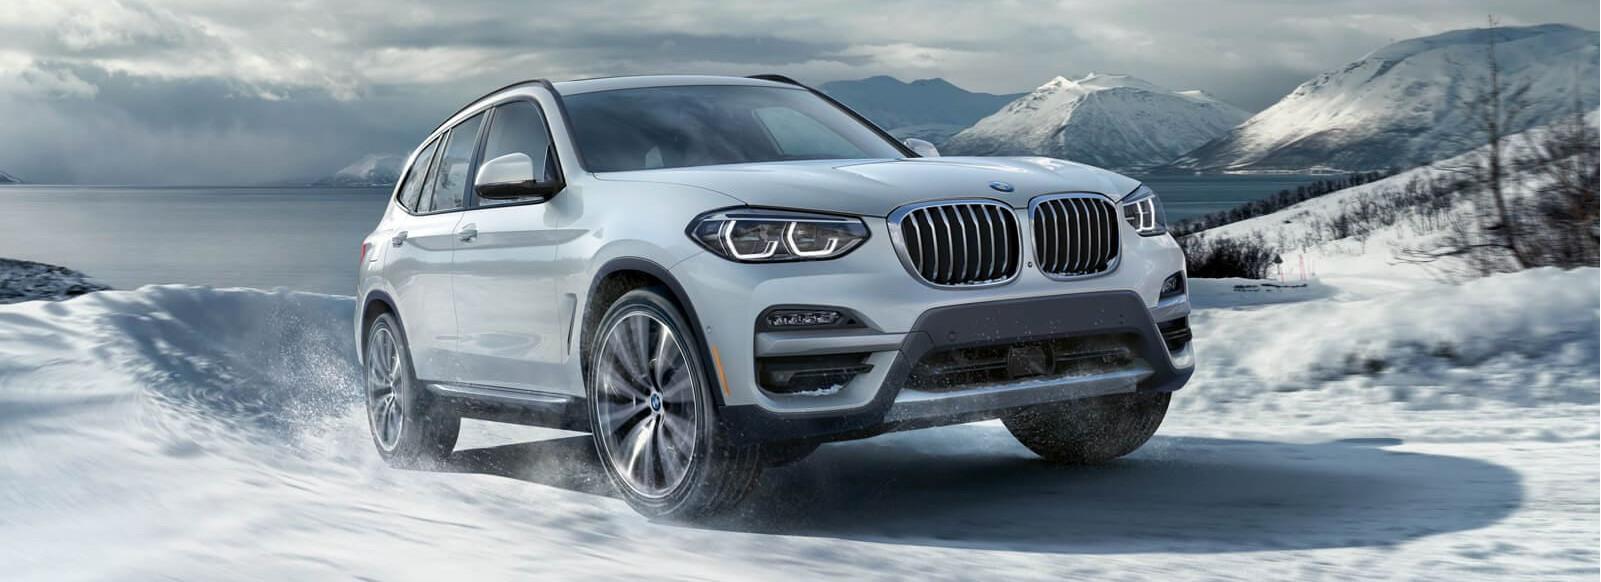 2020 BMW X3 vs 2020 INFINITI QX50 near Texarkana, TX